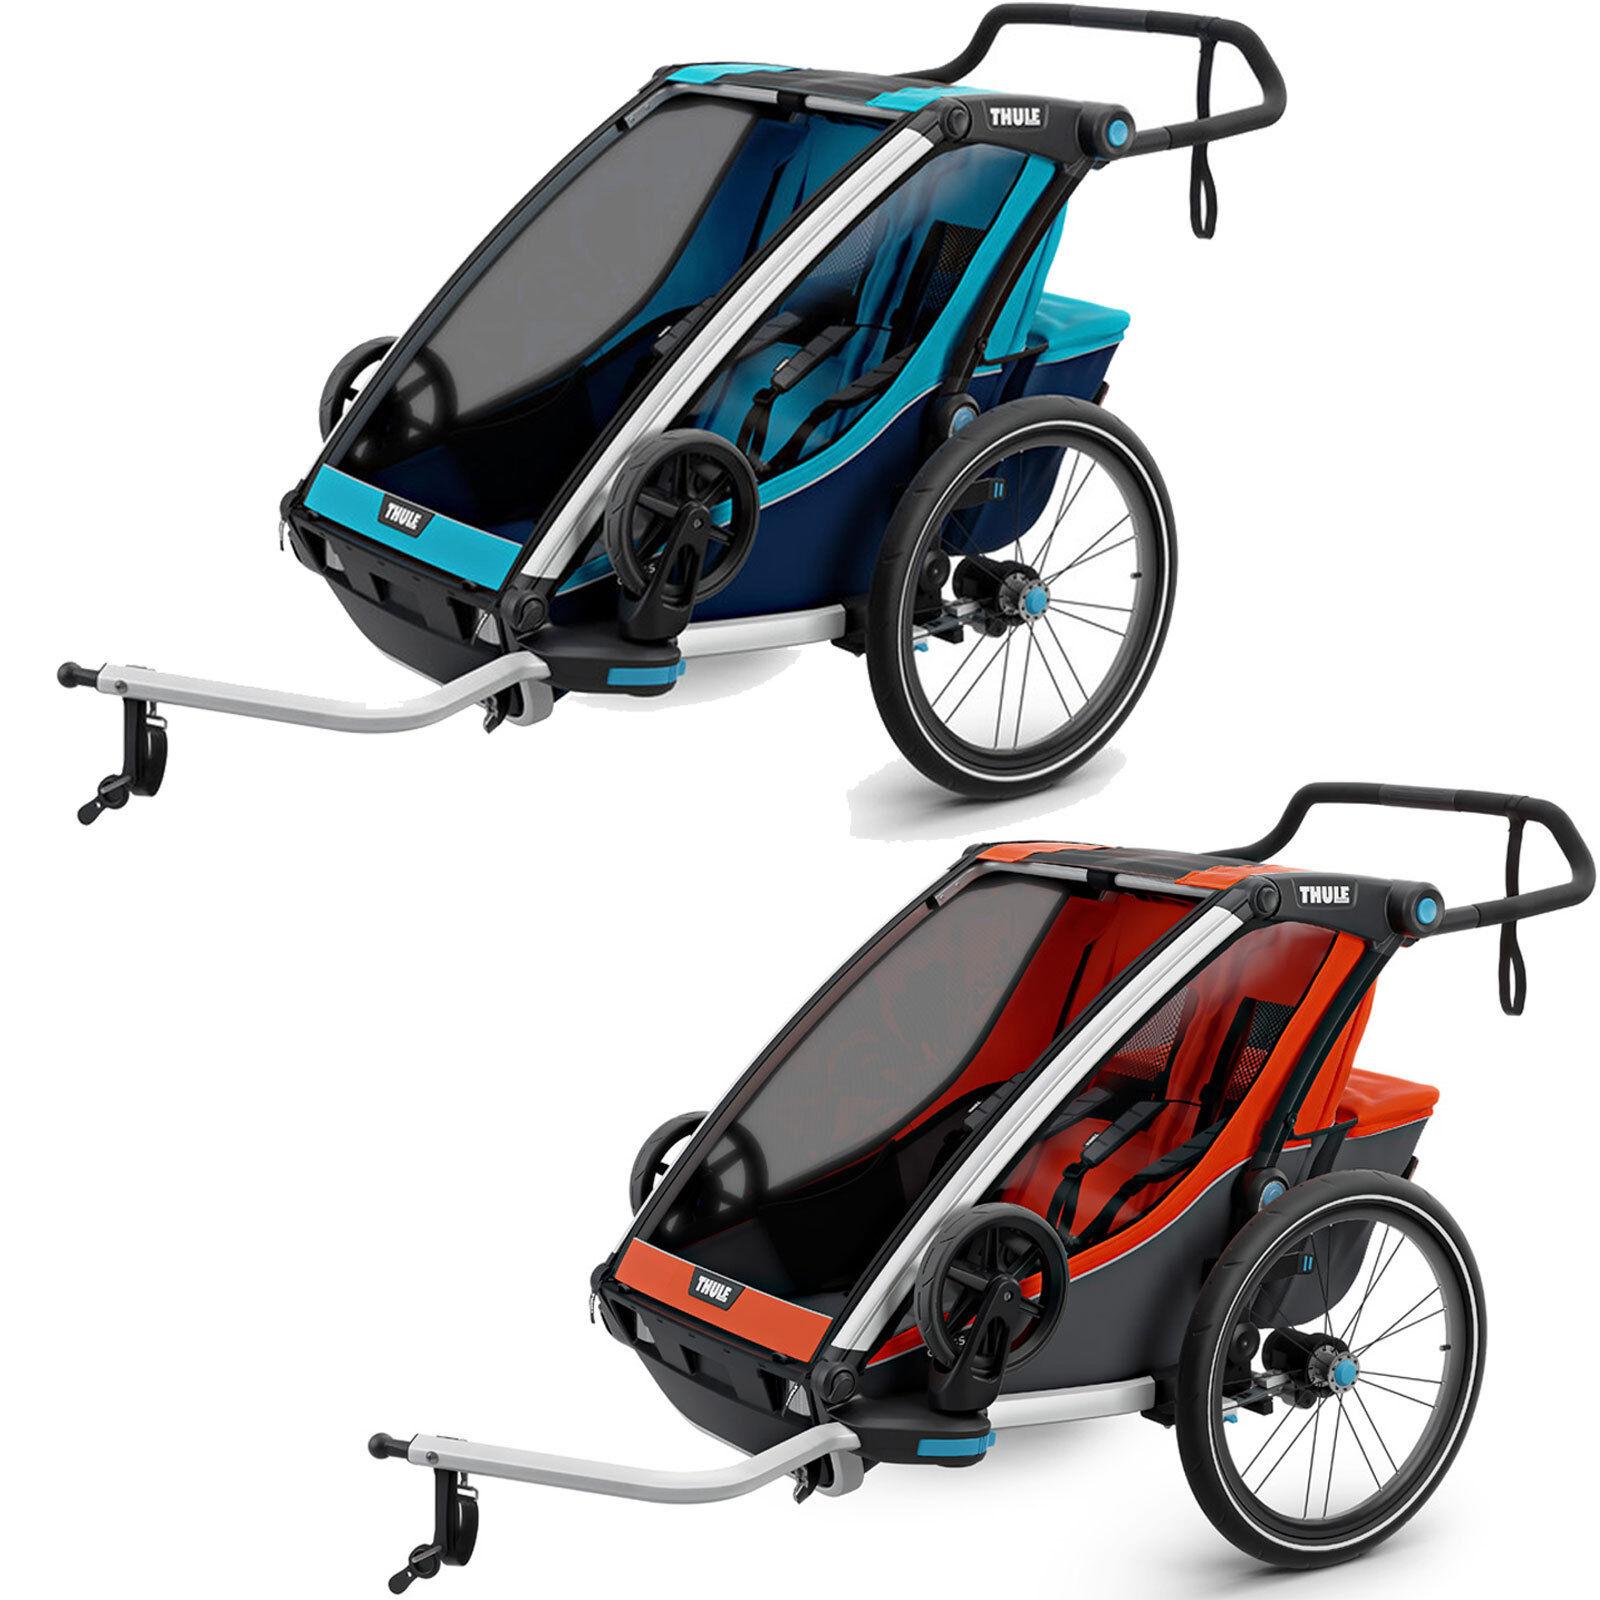 Thule Chariot Cross 2 Fahrradanhänger Multisport-Anhänger Zweisitzer Kinder NEU